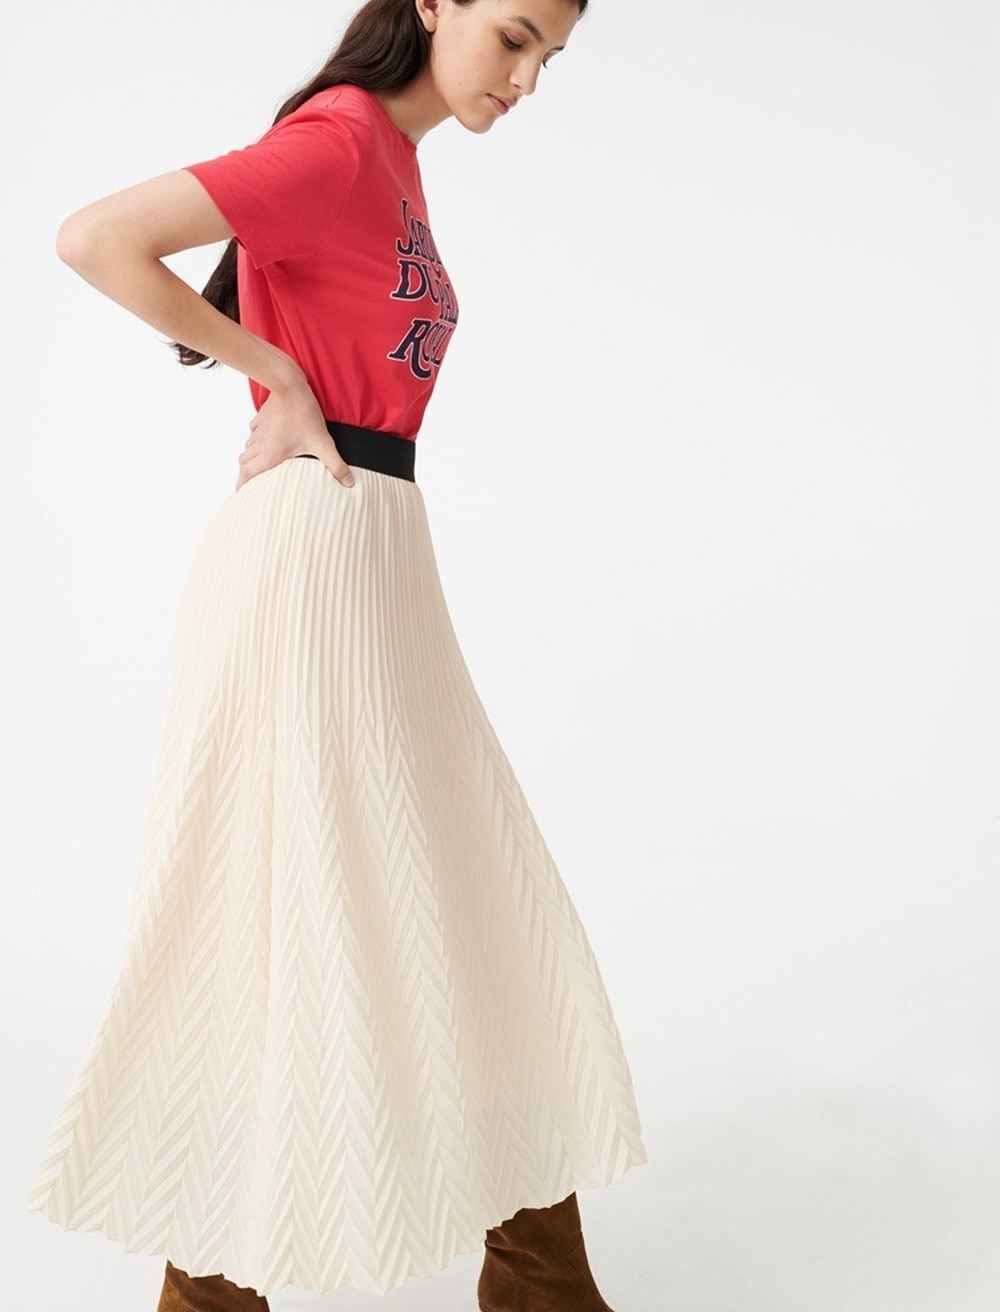 2020 Spring Summer Temperament Lady Elastic Waist Long Skirt Herringbone Pattern Wave Pattern Womens Pleated Skirt White Solid